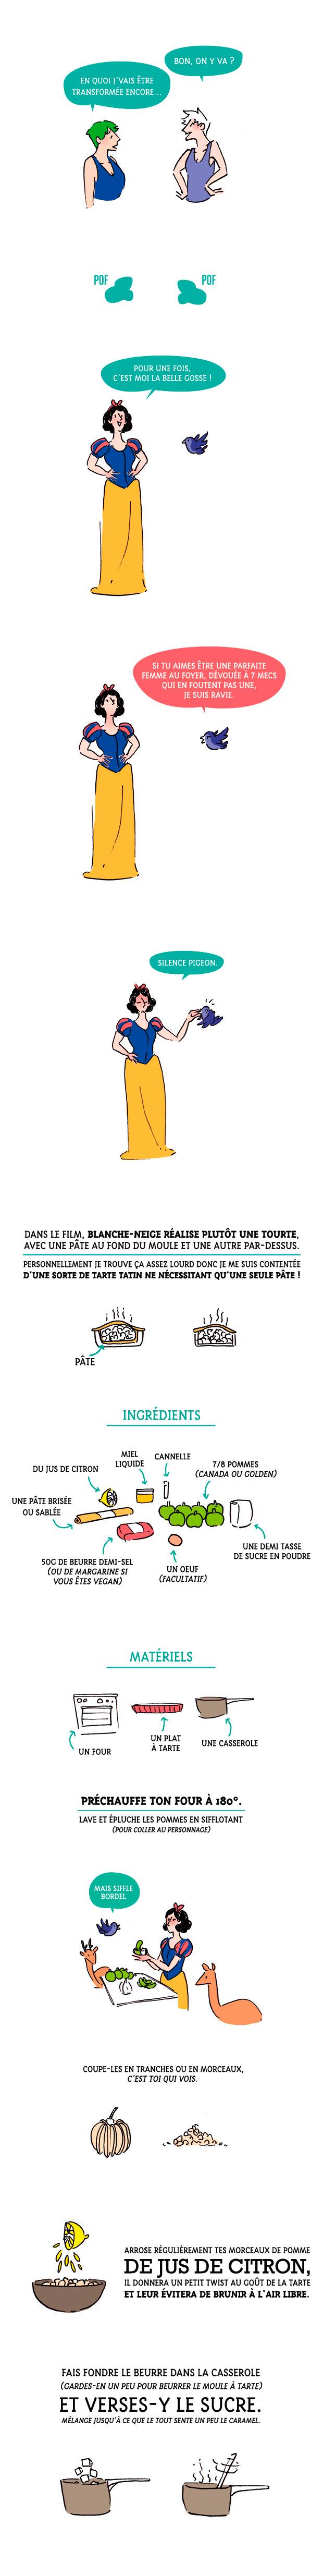 recette-disney-blanche-neige-tarte-aux-pommes-4